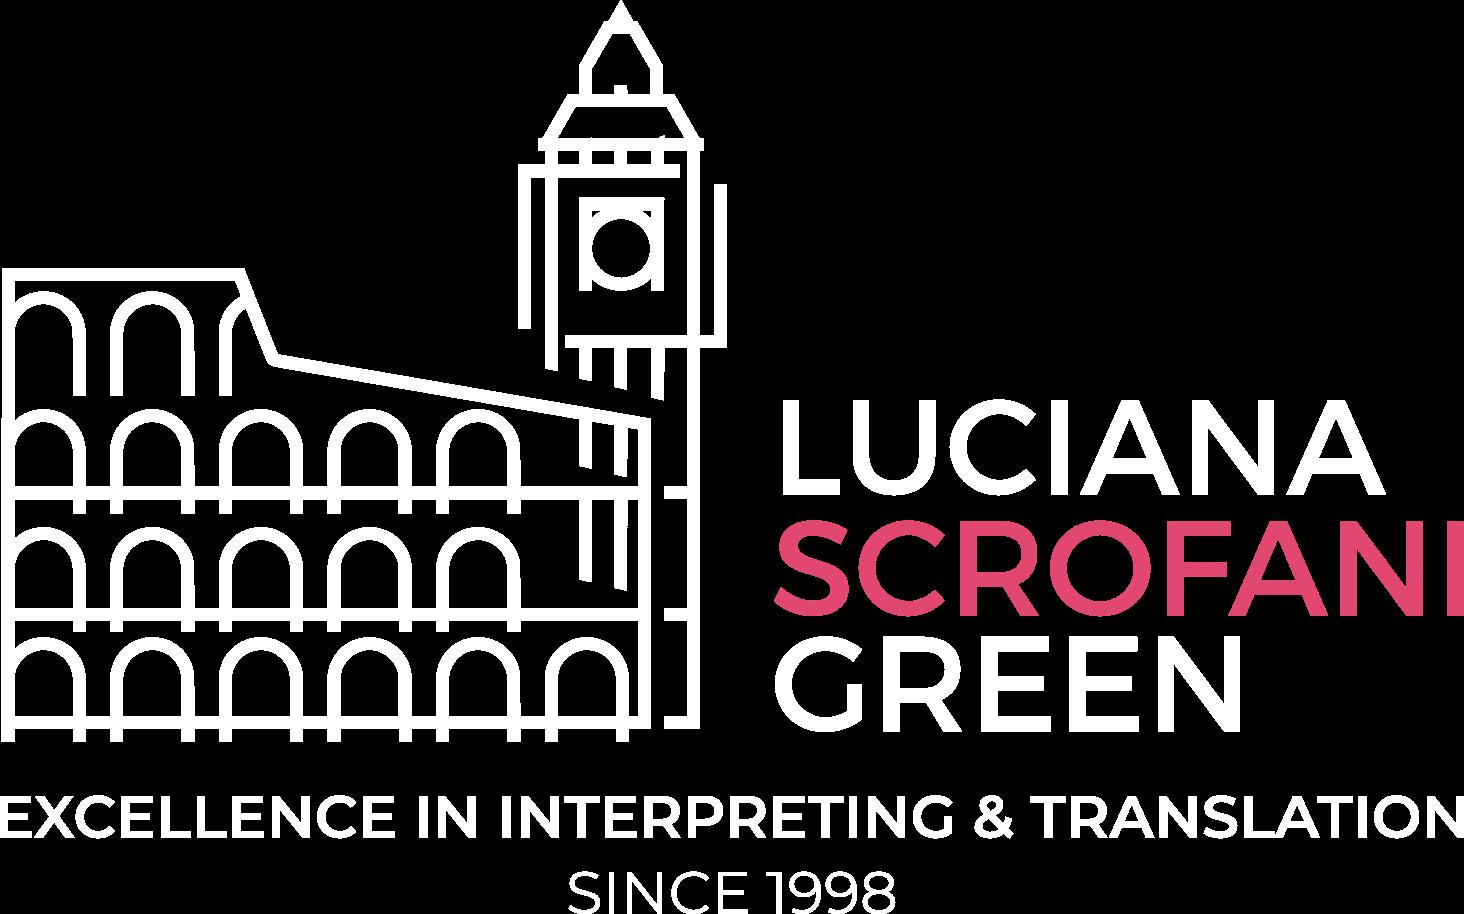 Luciana Scrofani Green